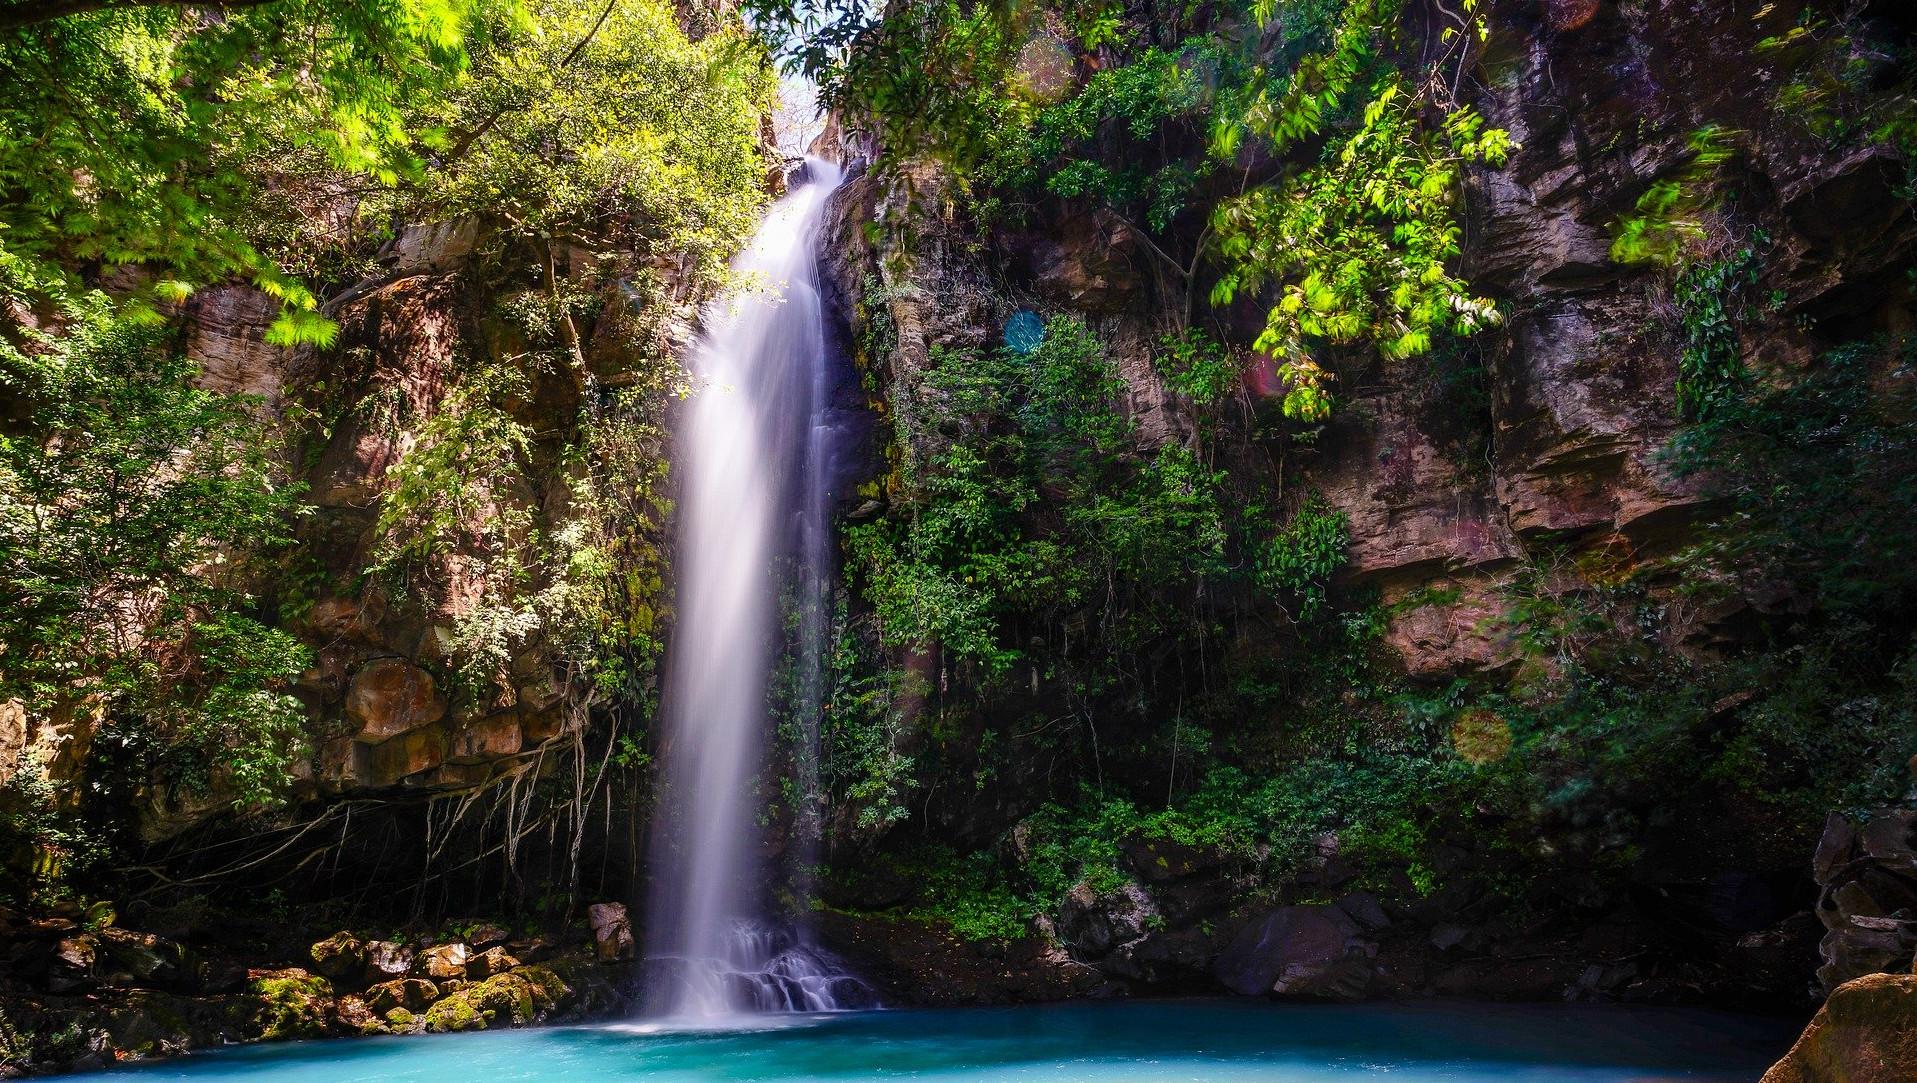 caraïbes et pacifique au Costa Rica